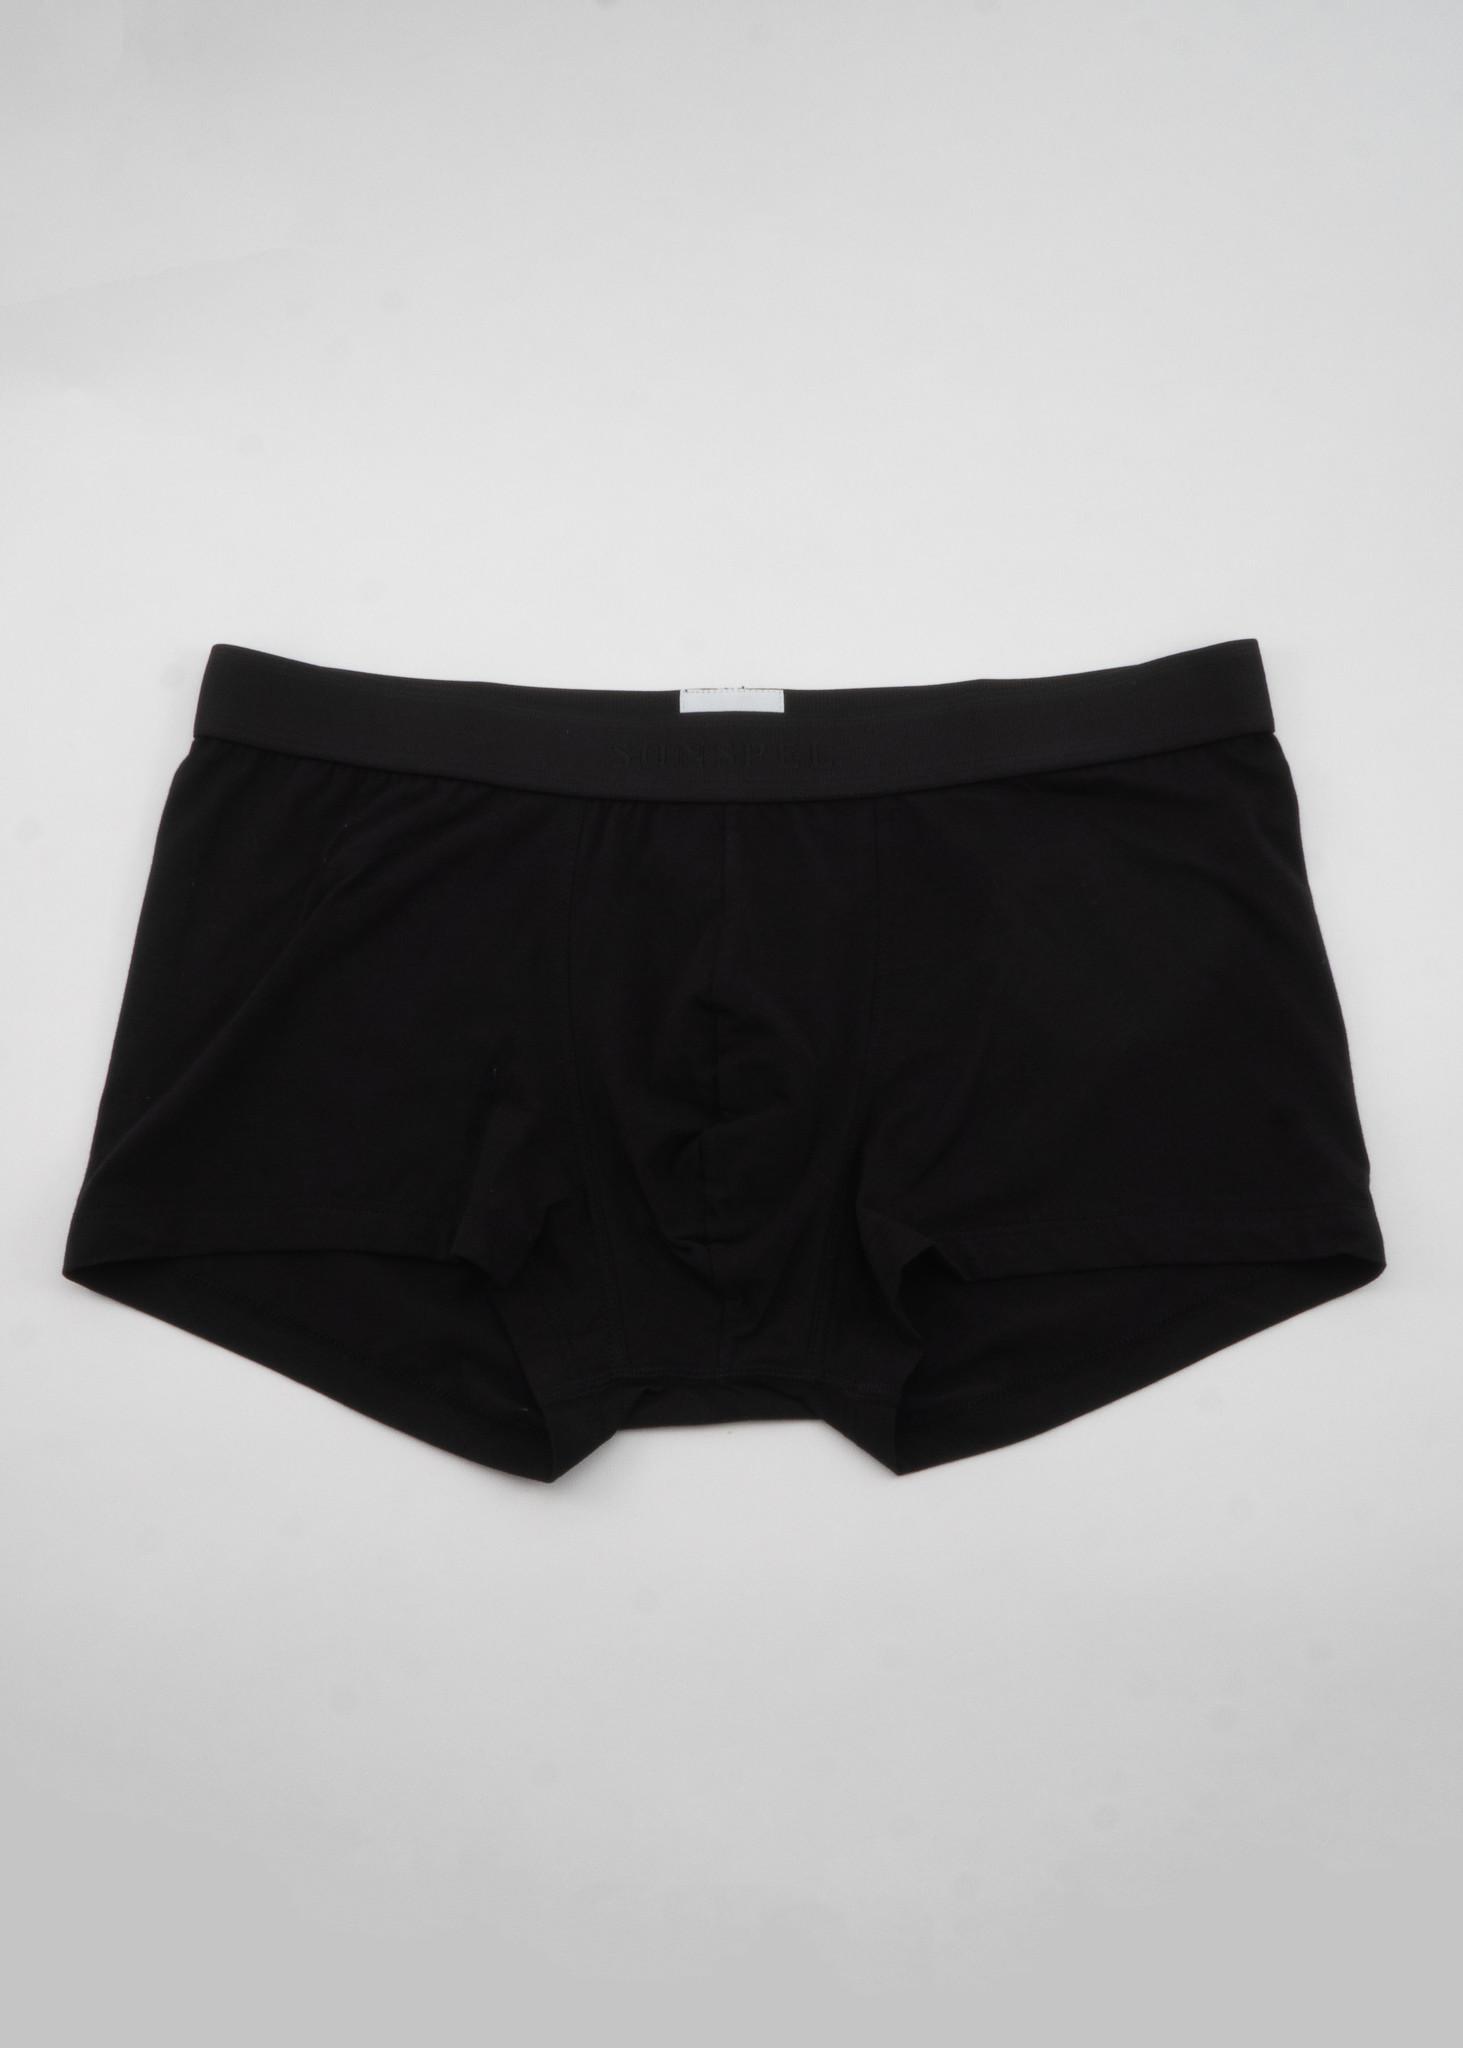 Black Stretch Cotton Trunks